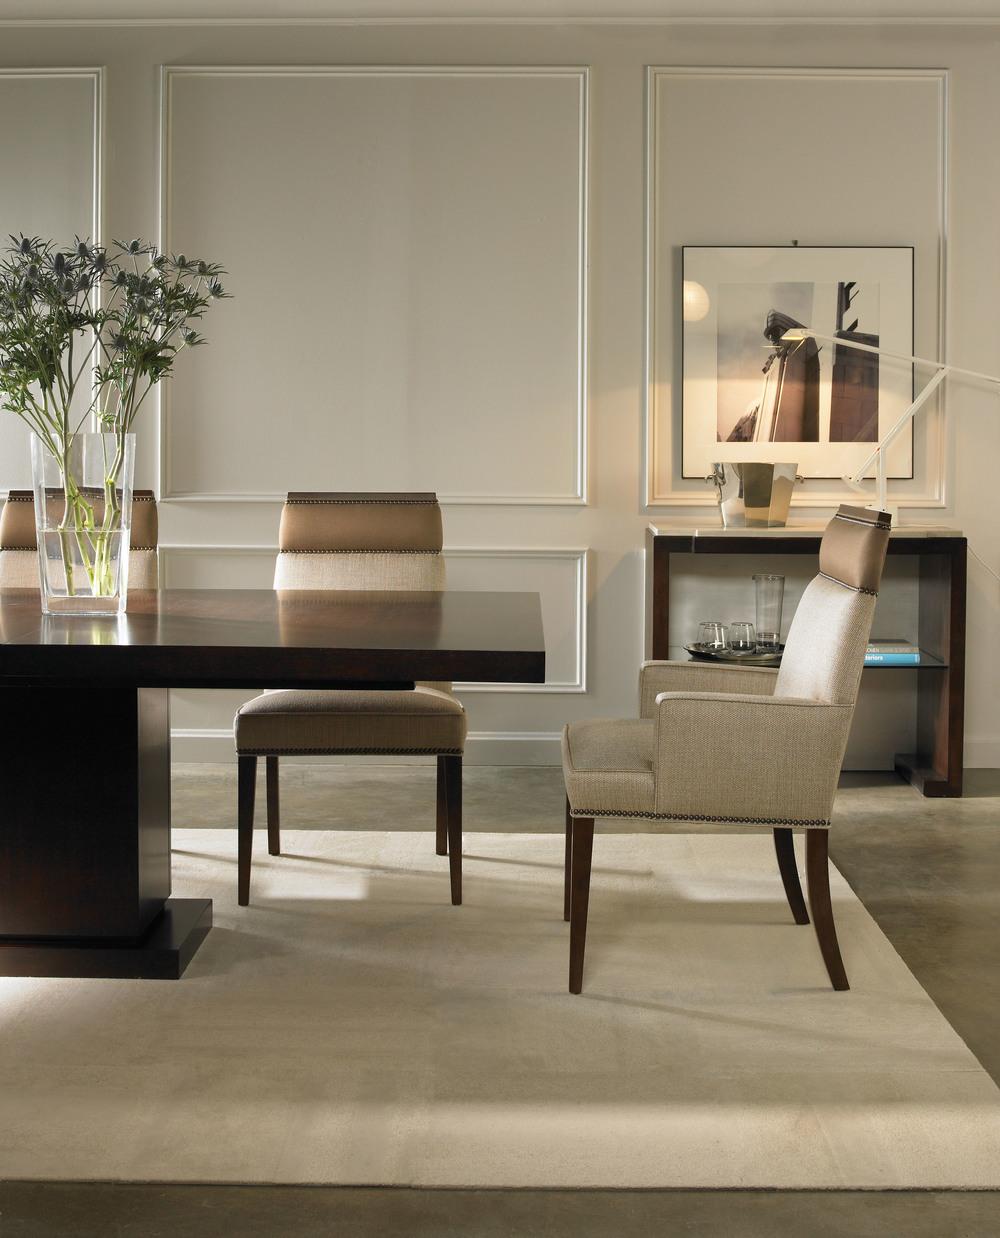 Vanguard Furniture - Bradford Dining Table